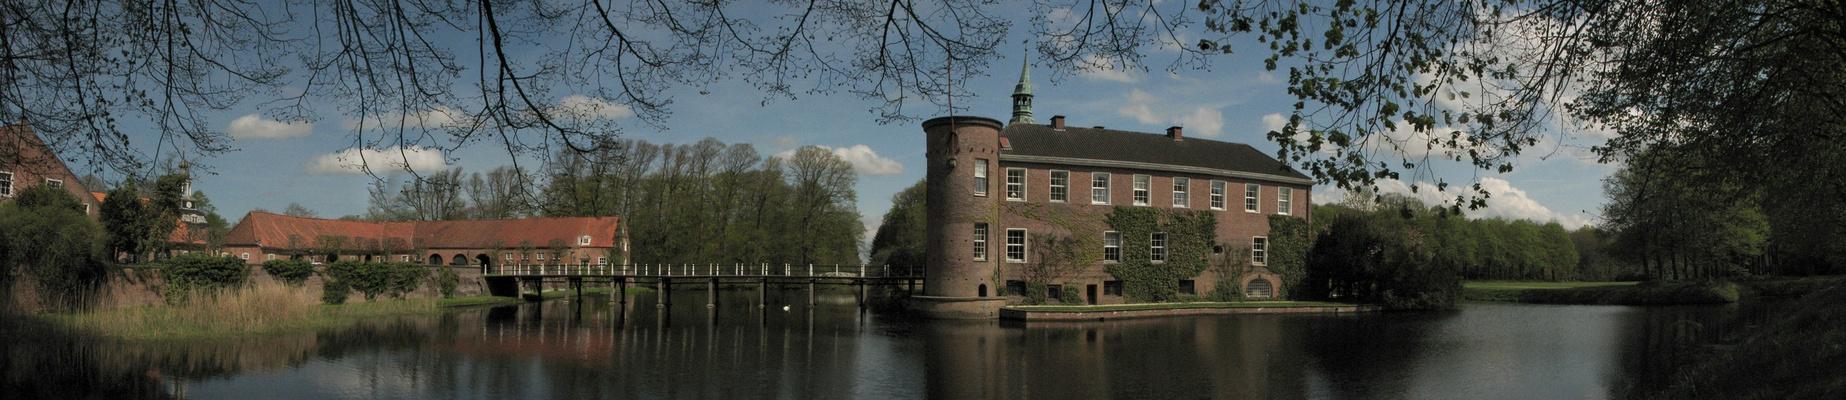 Castle Frisia